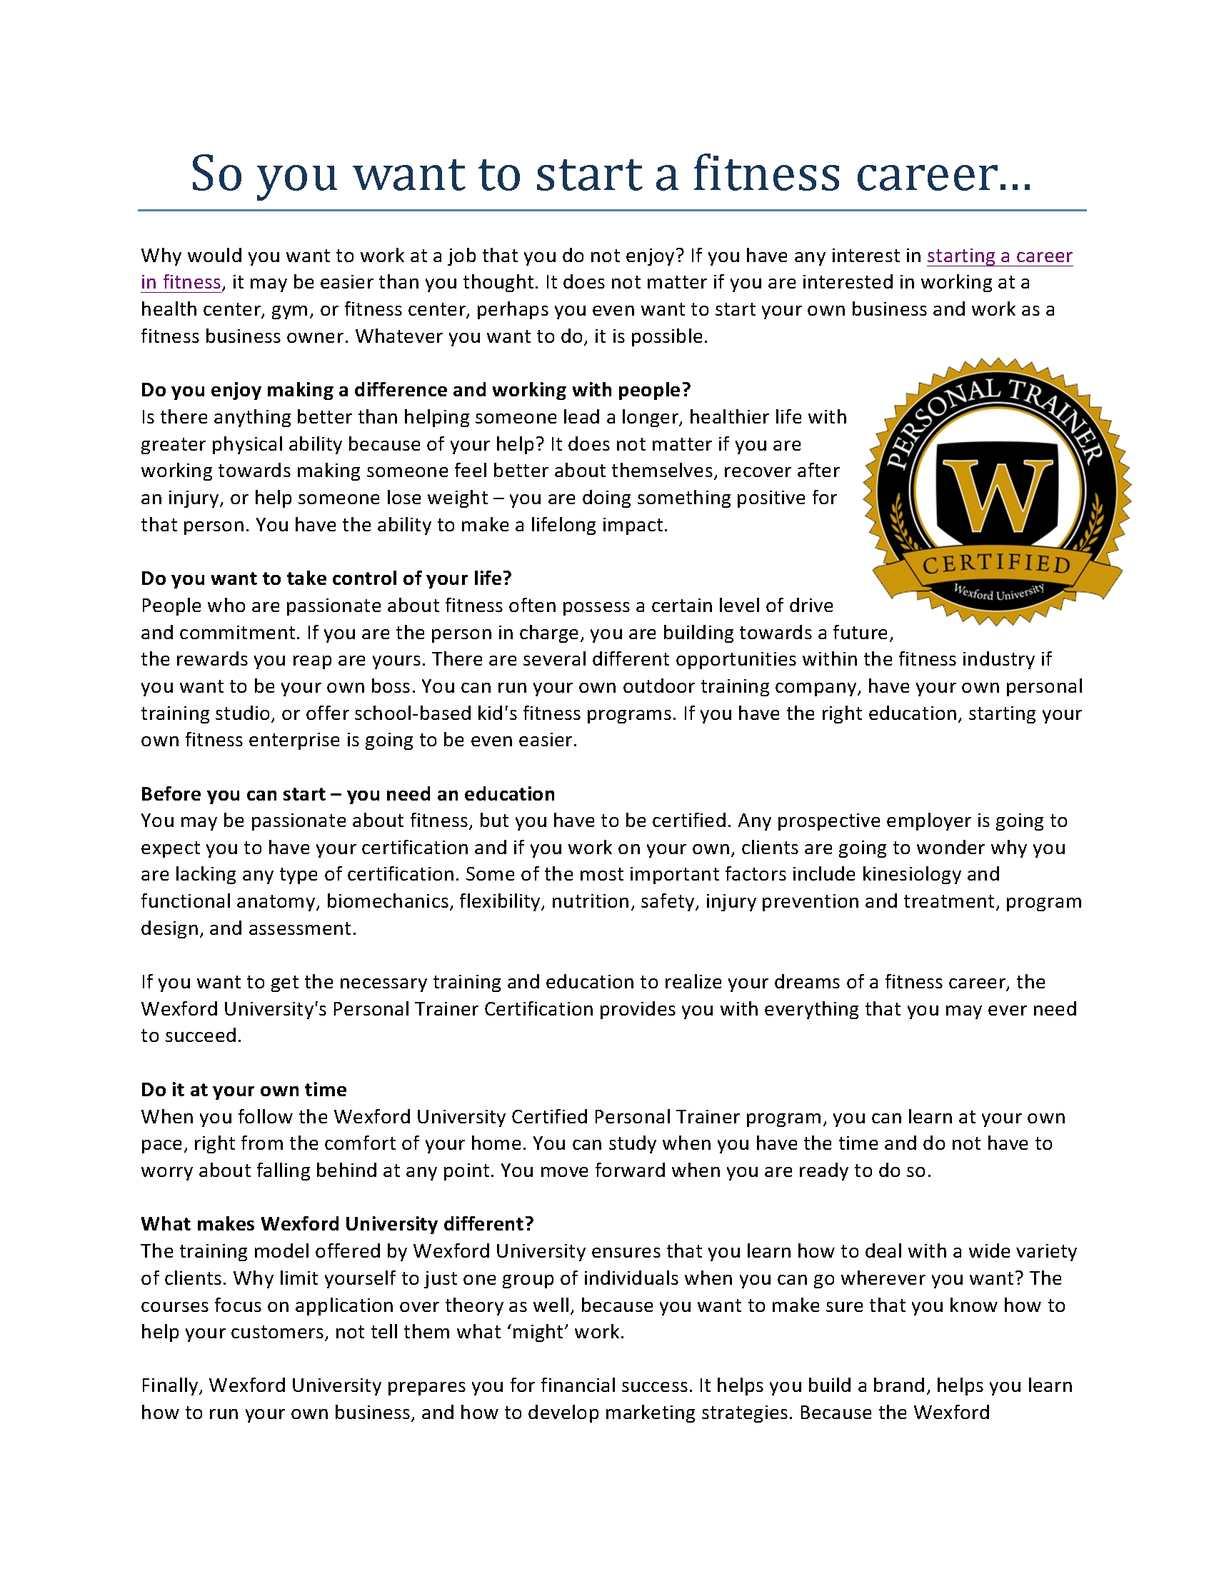 Calamo How To Start A Successful And Rewarding Career As A